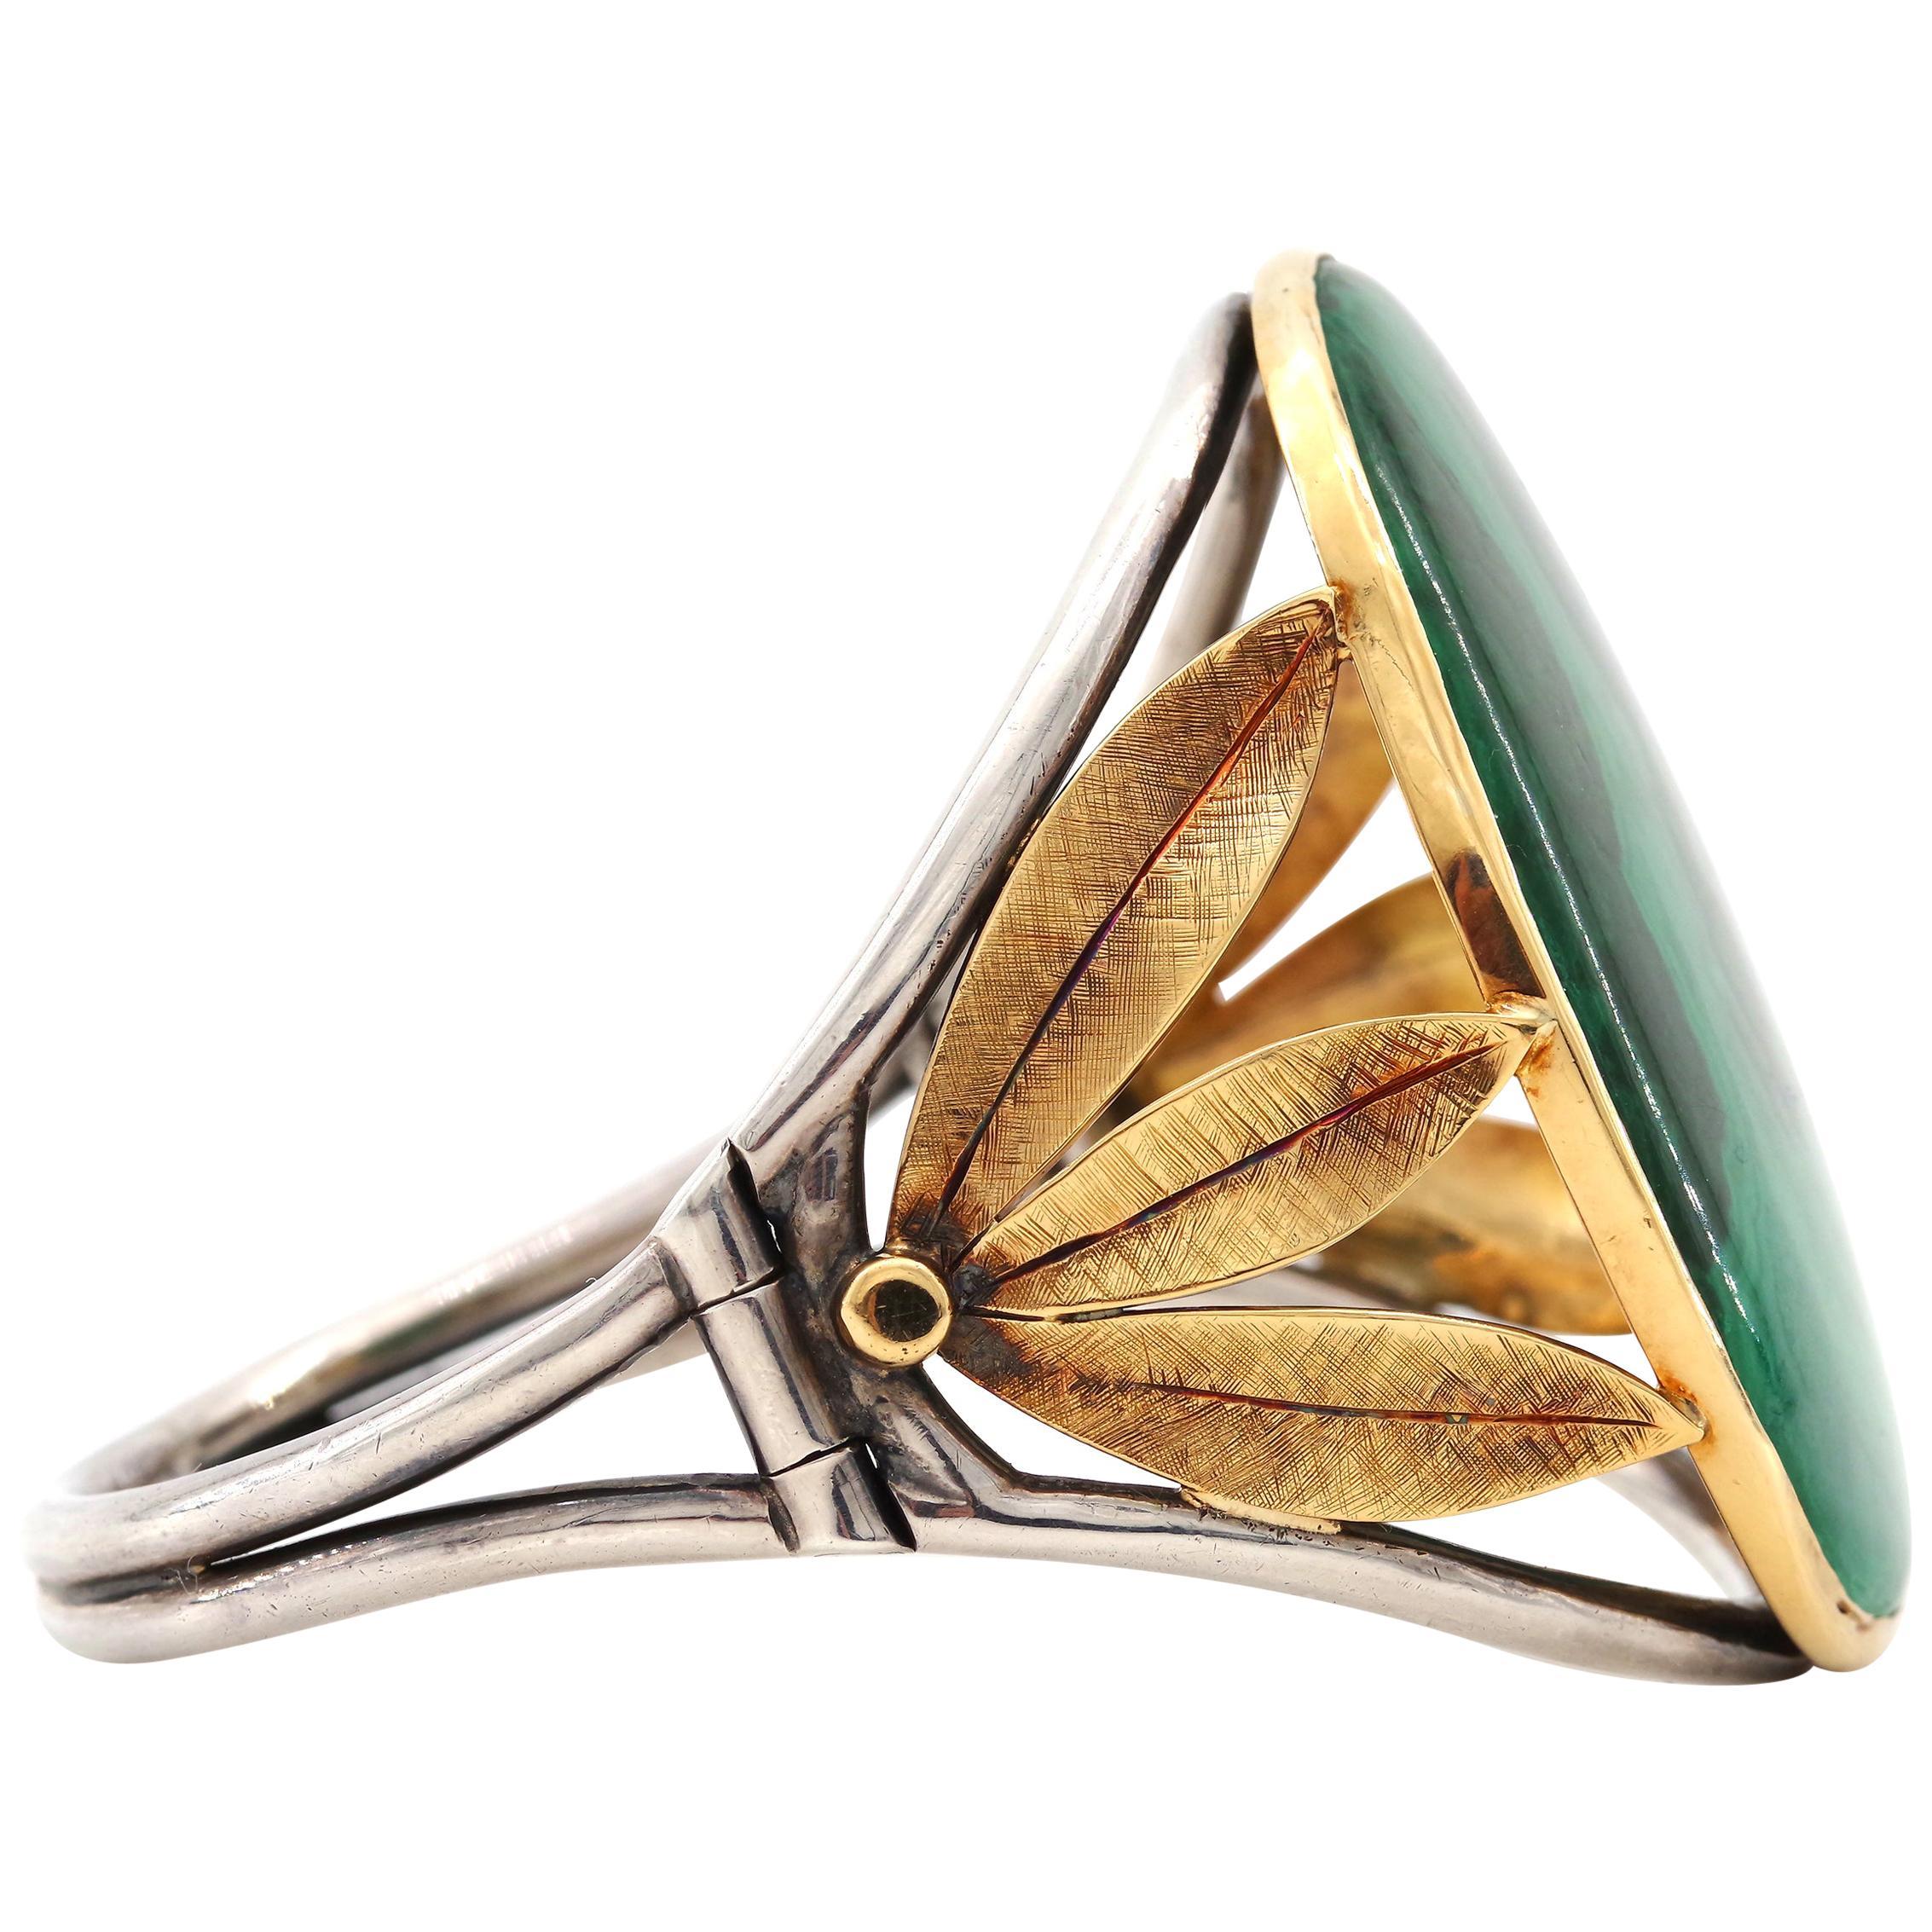 Gold & Silver Cuff Bracelet with Malachite